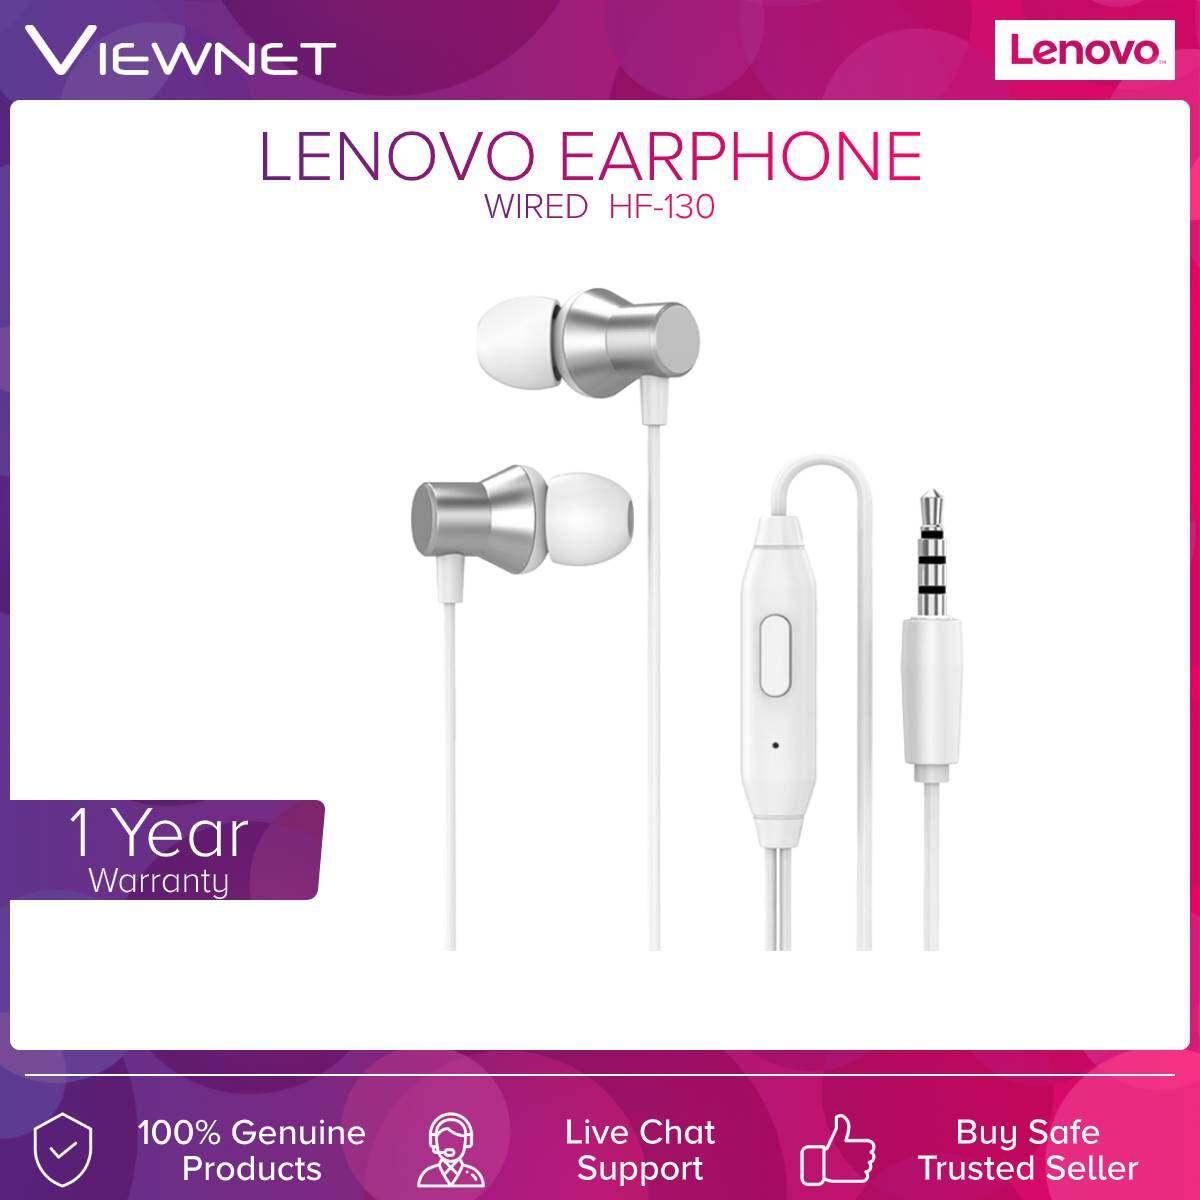 Lenovo (HF-130) Wired Earphone